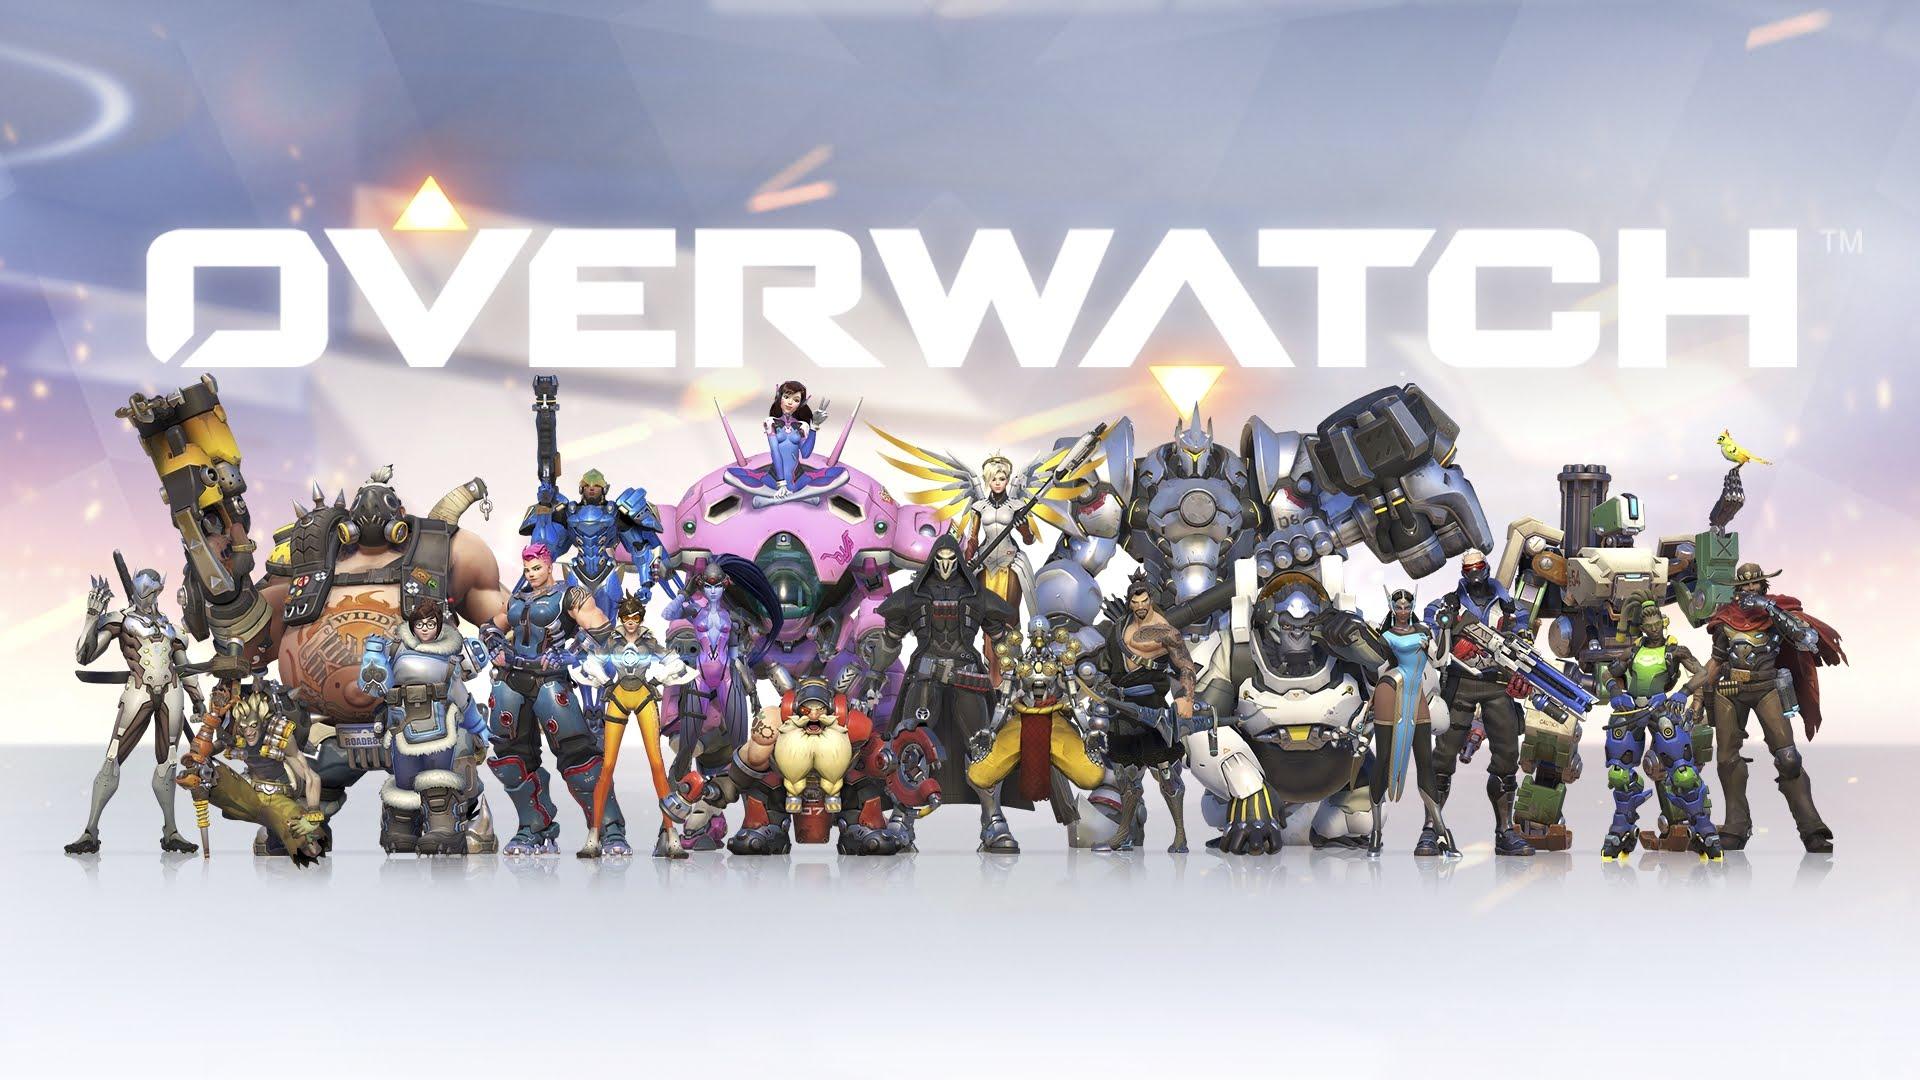 2017-02-24 - Image02 - Overwatch